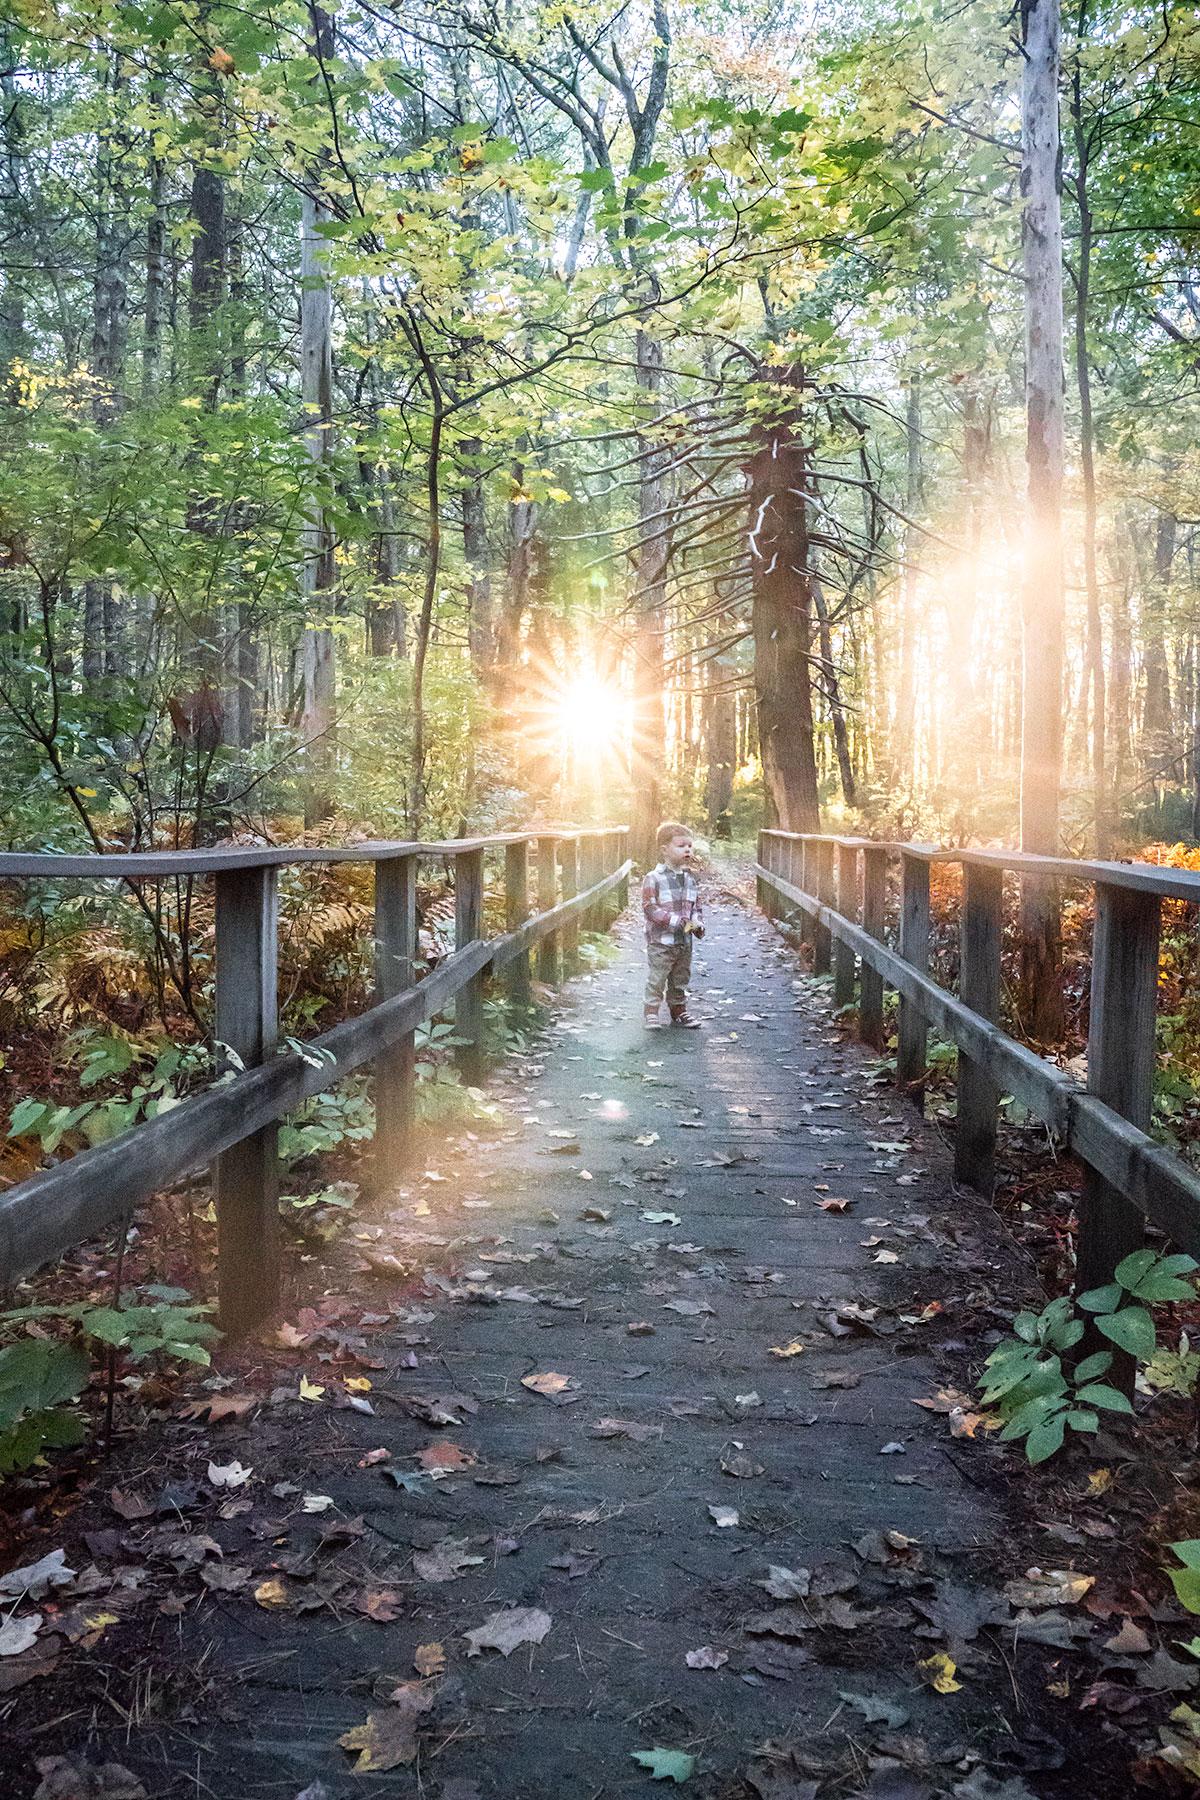 Autumn-at-Rachel-Carson-Refuge-Maine